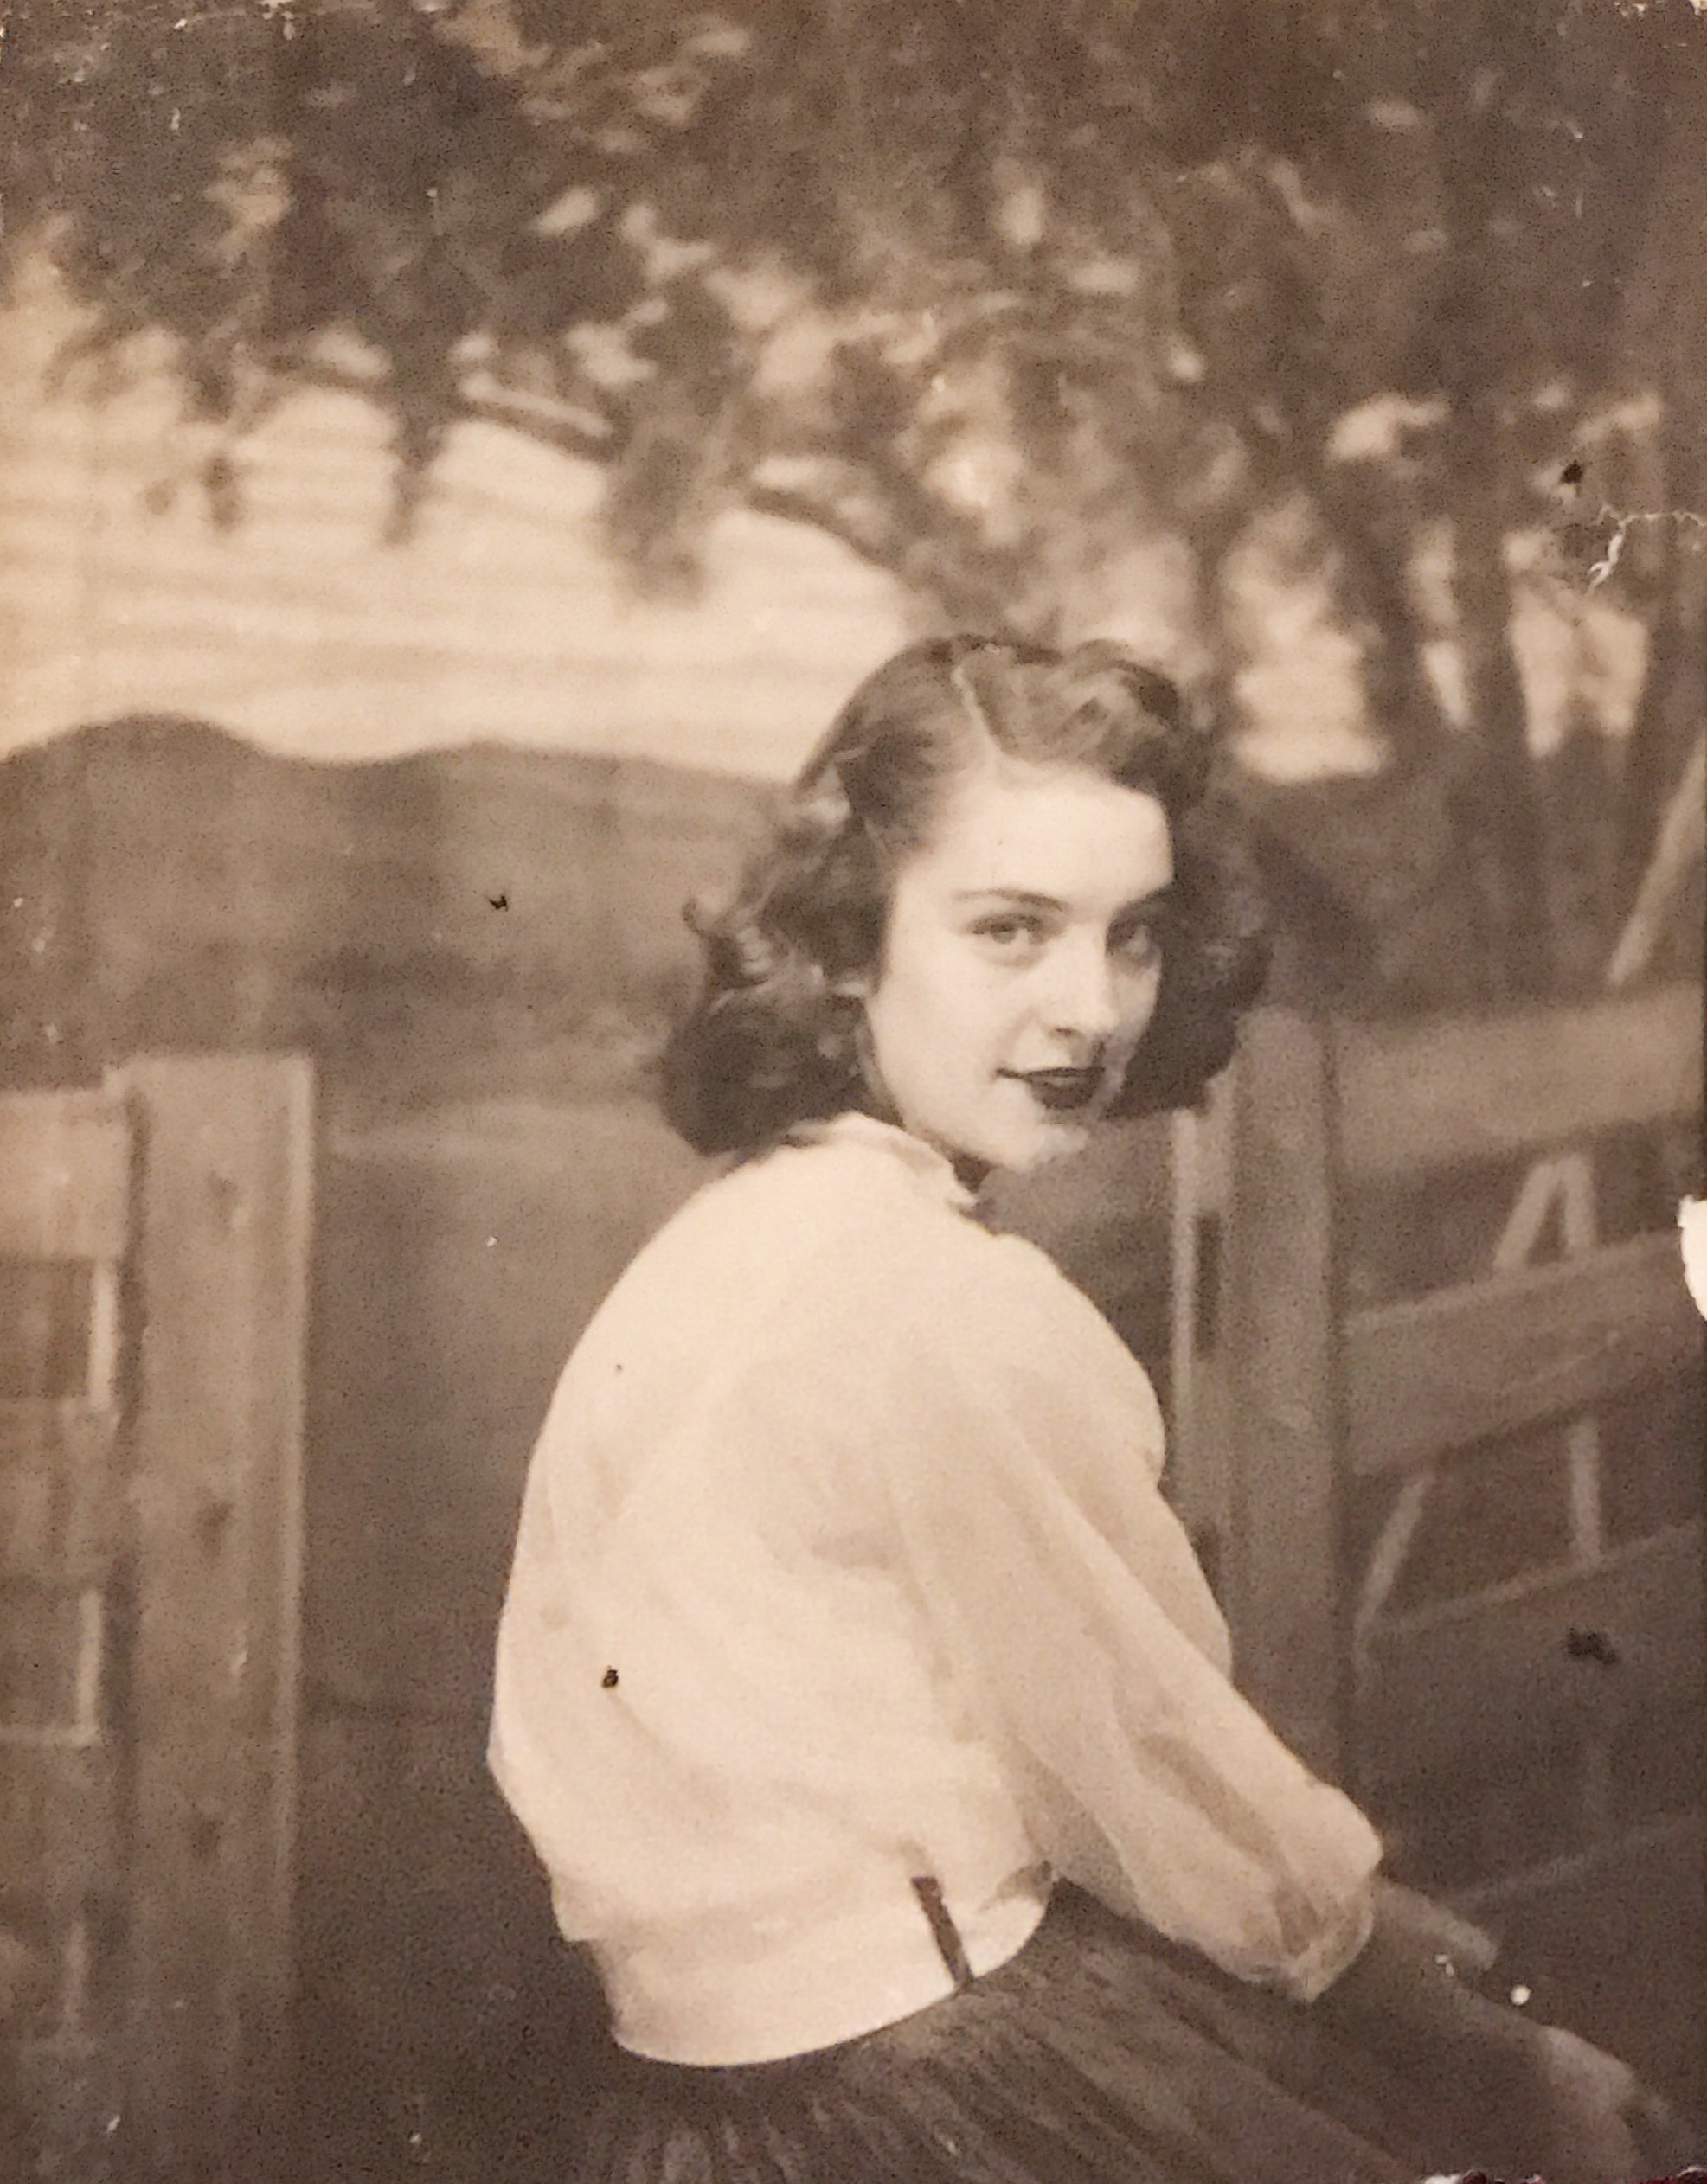 My mom, Janice Lynn Tincher, 4/1/1939–12/30/2018